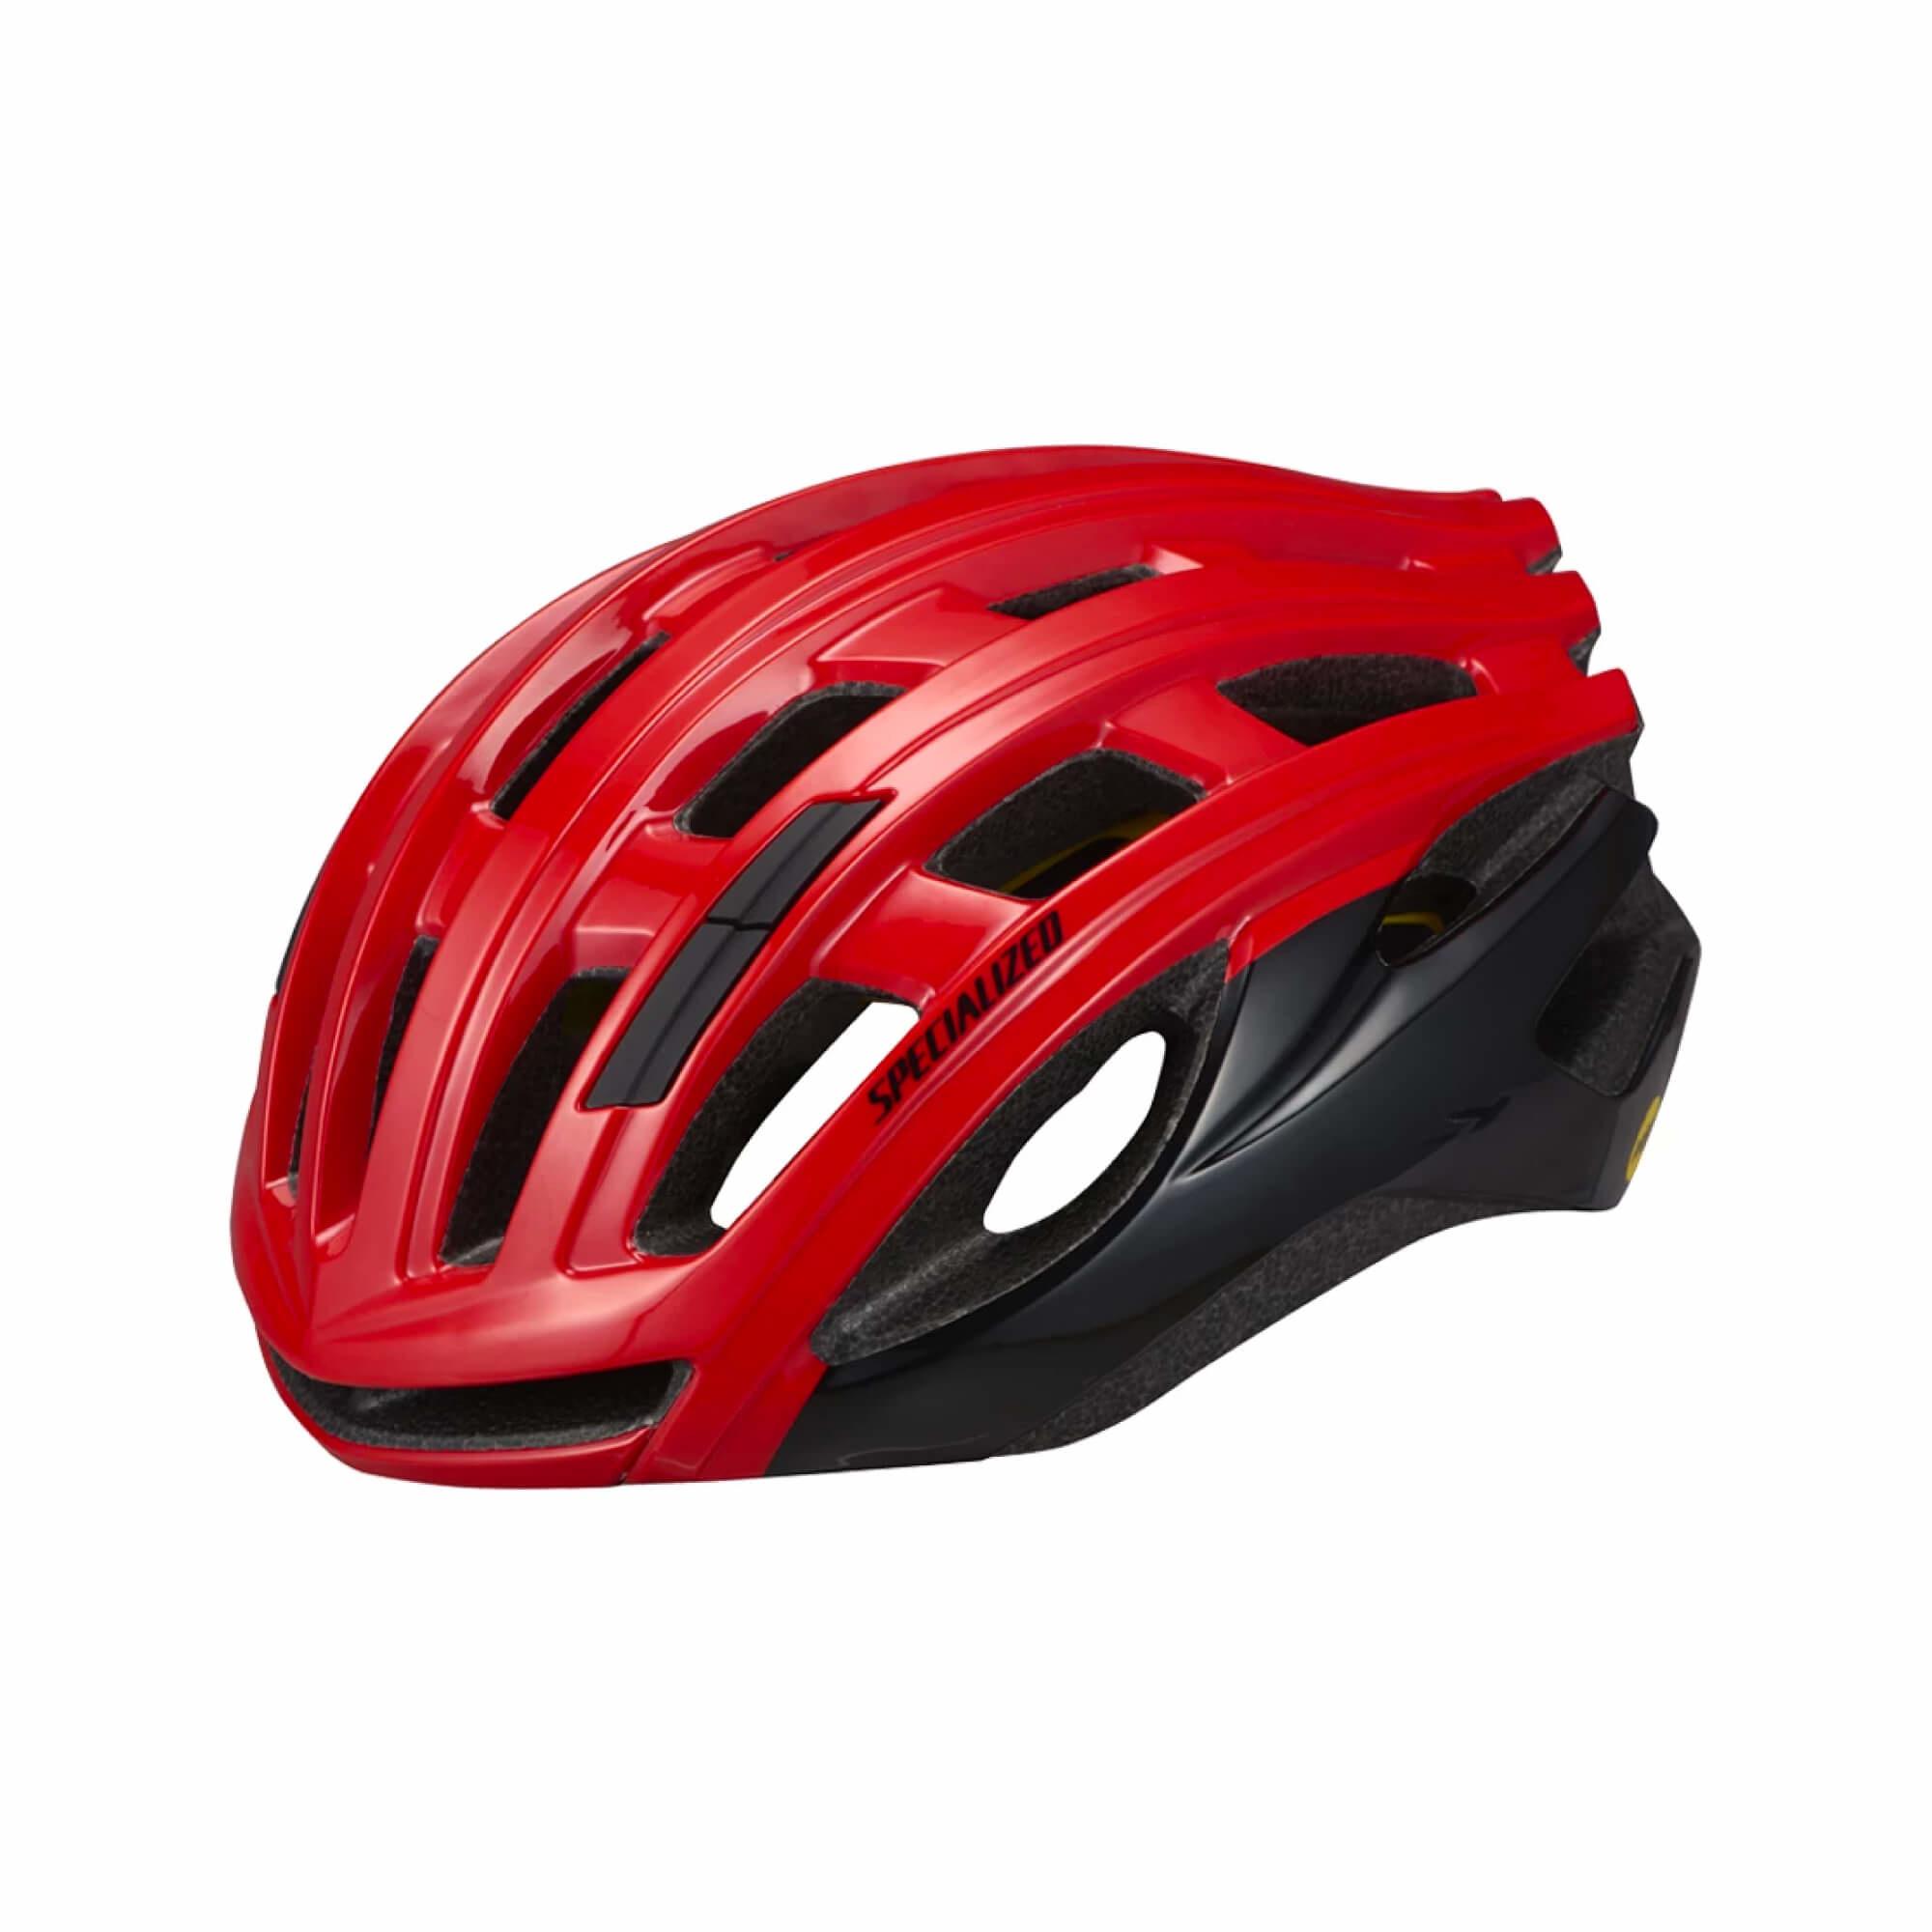 Propero 3 Helmet Angi Mips-3